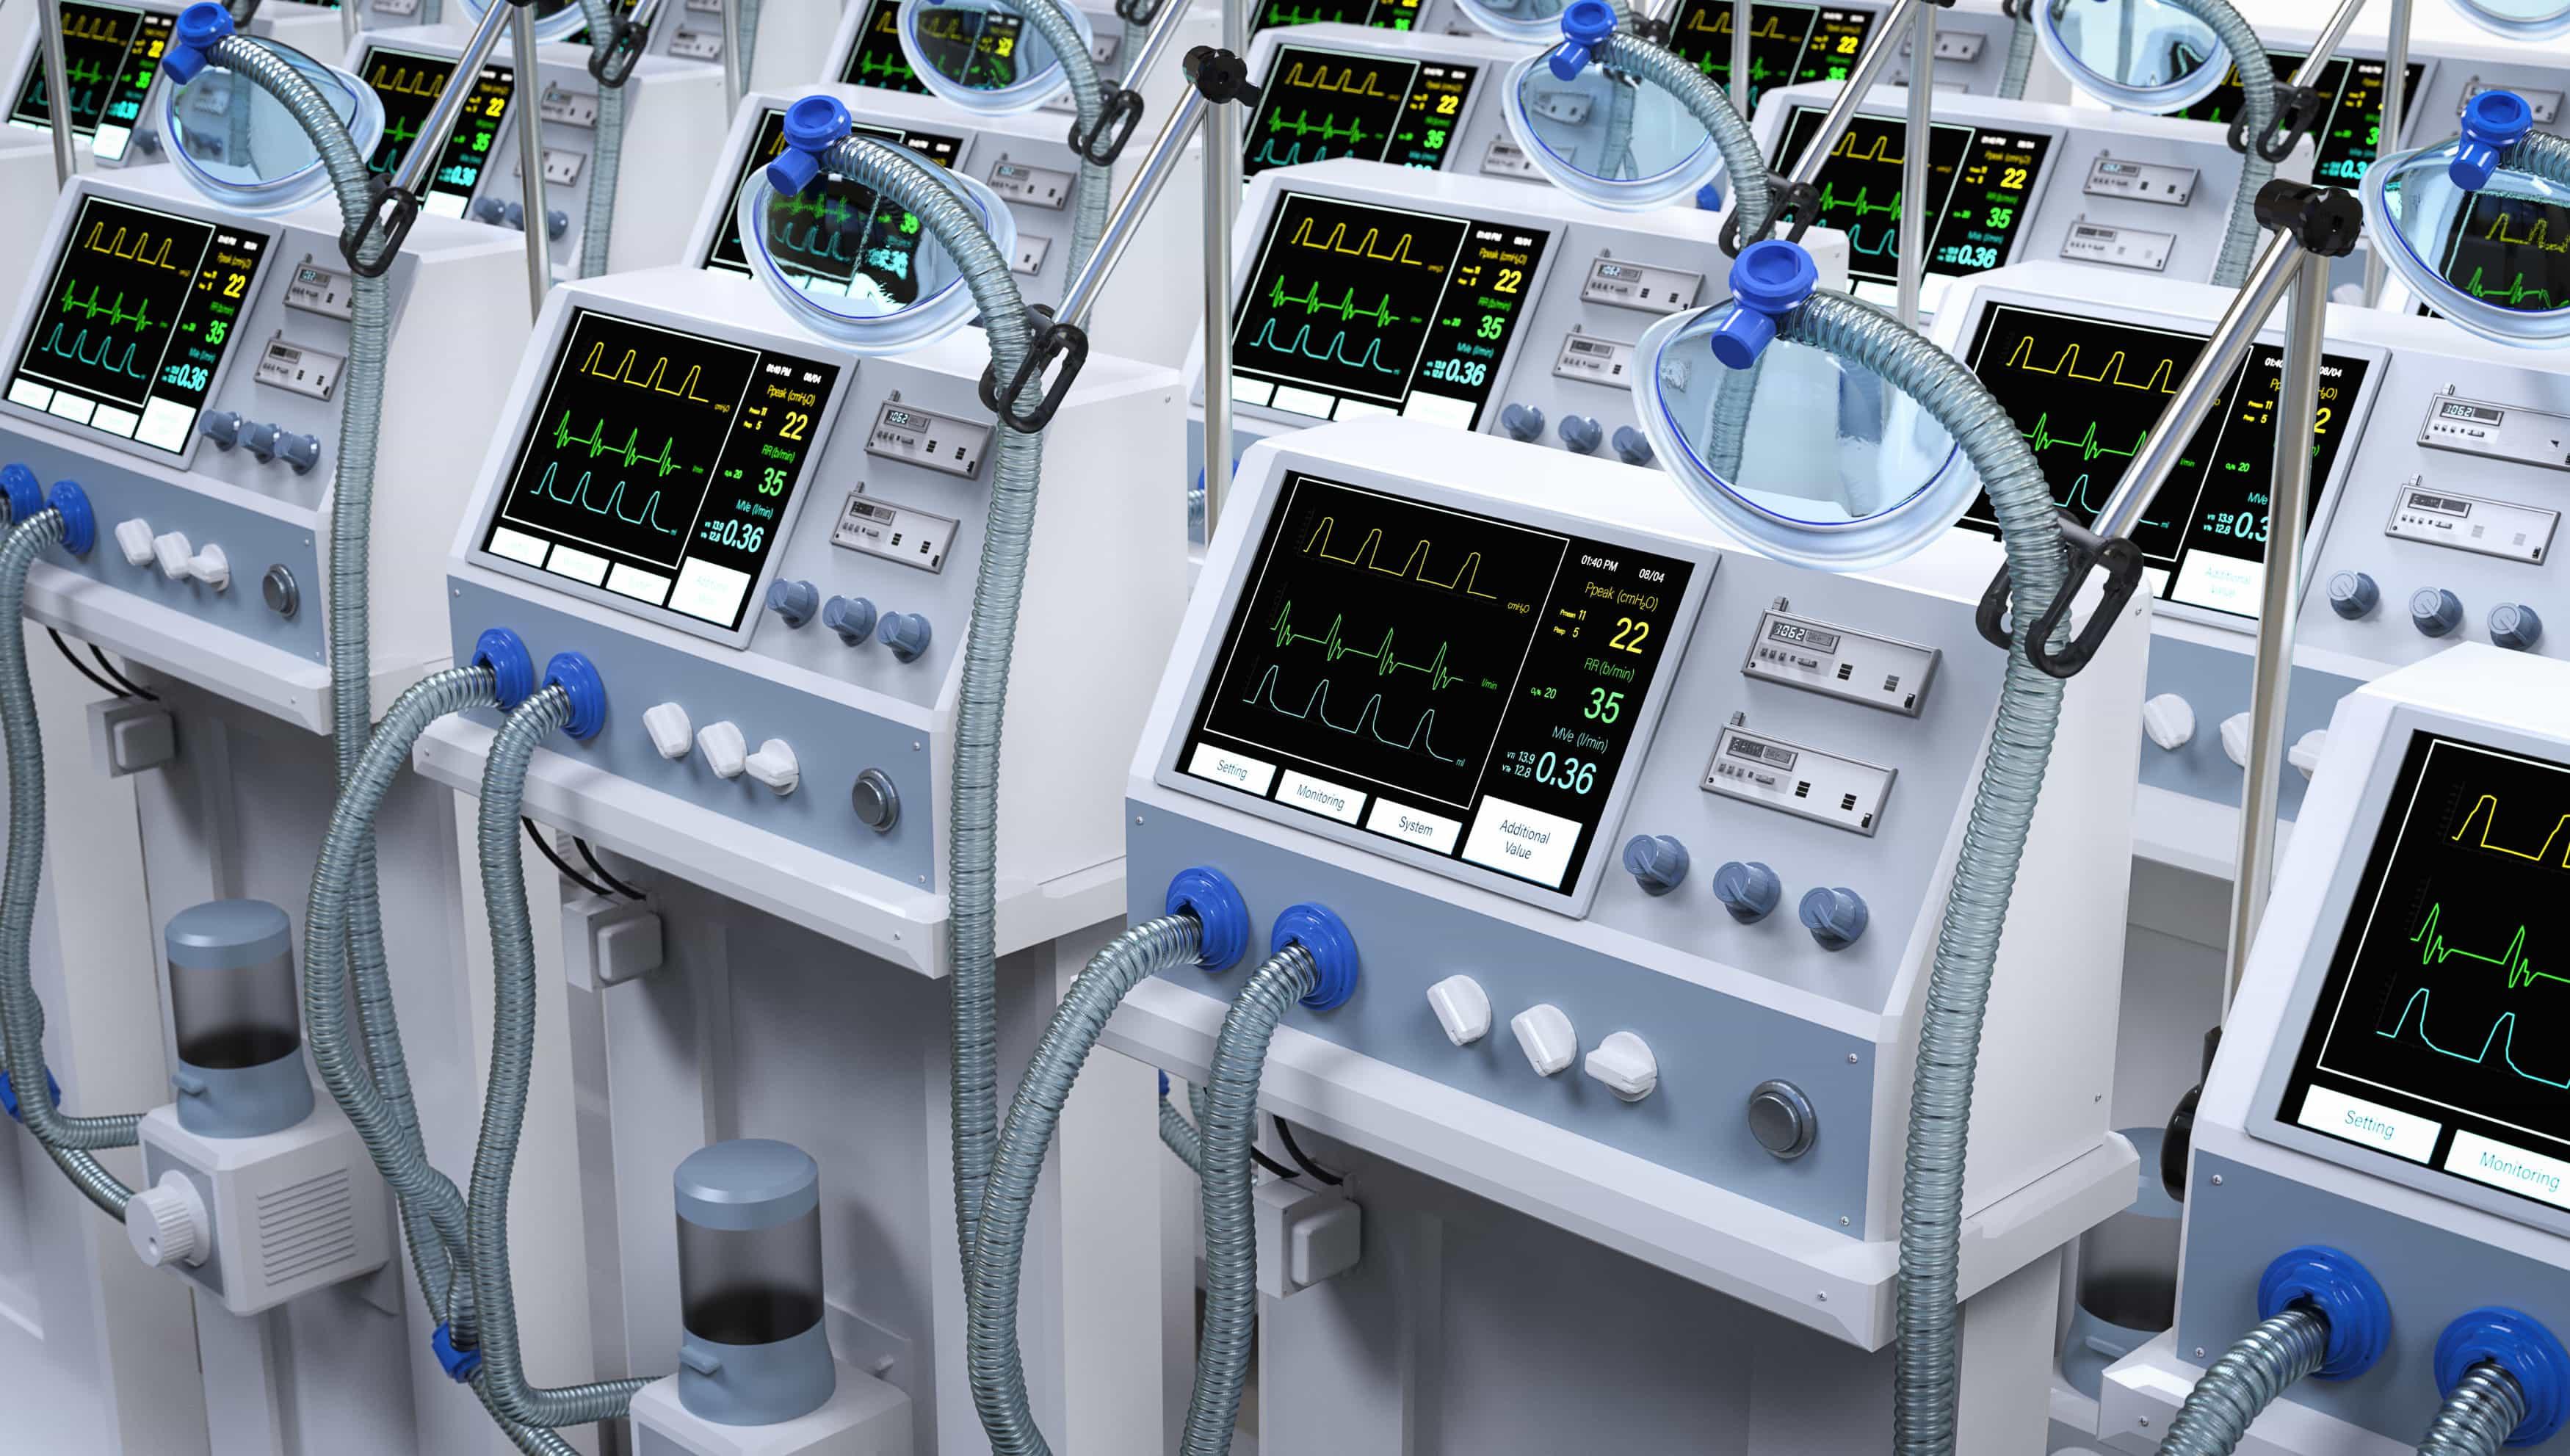 ventilator-1-3500x1983.jpeg